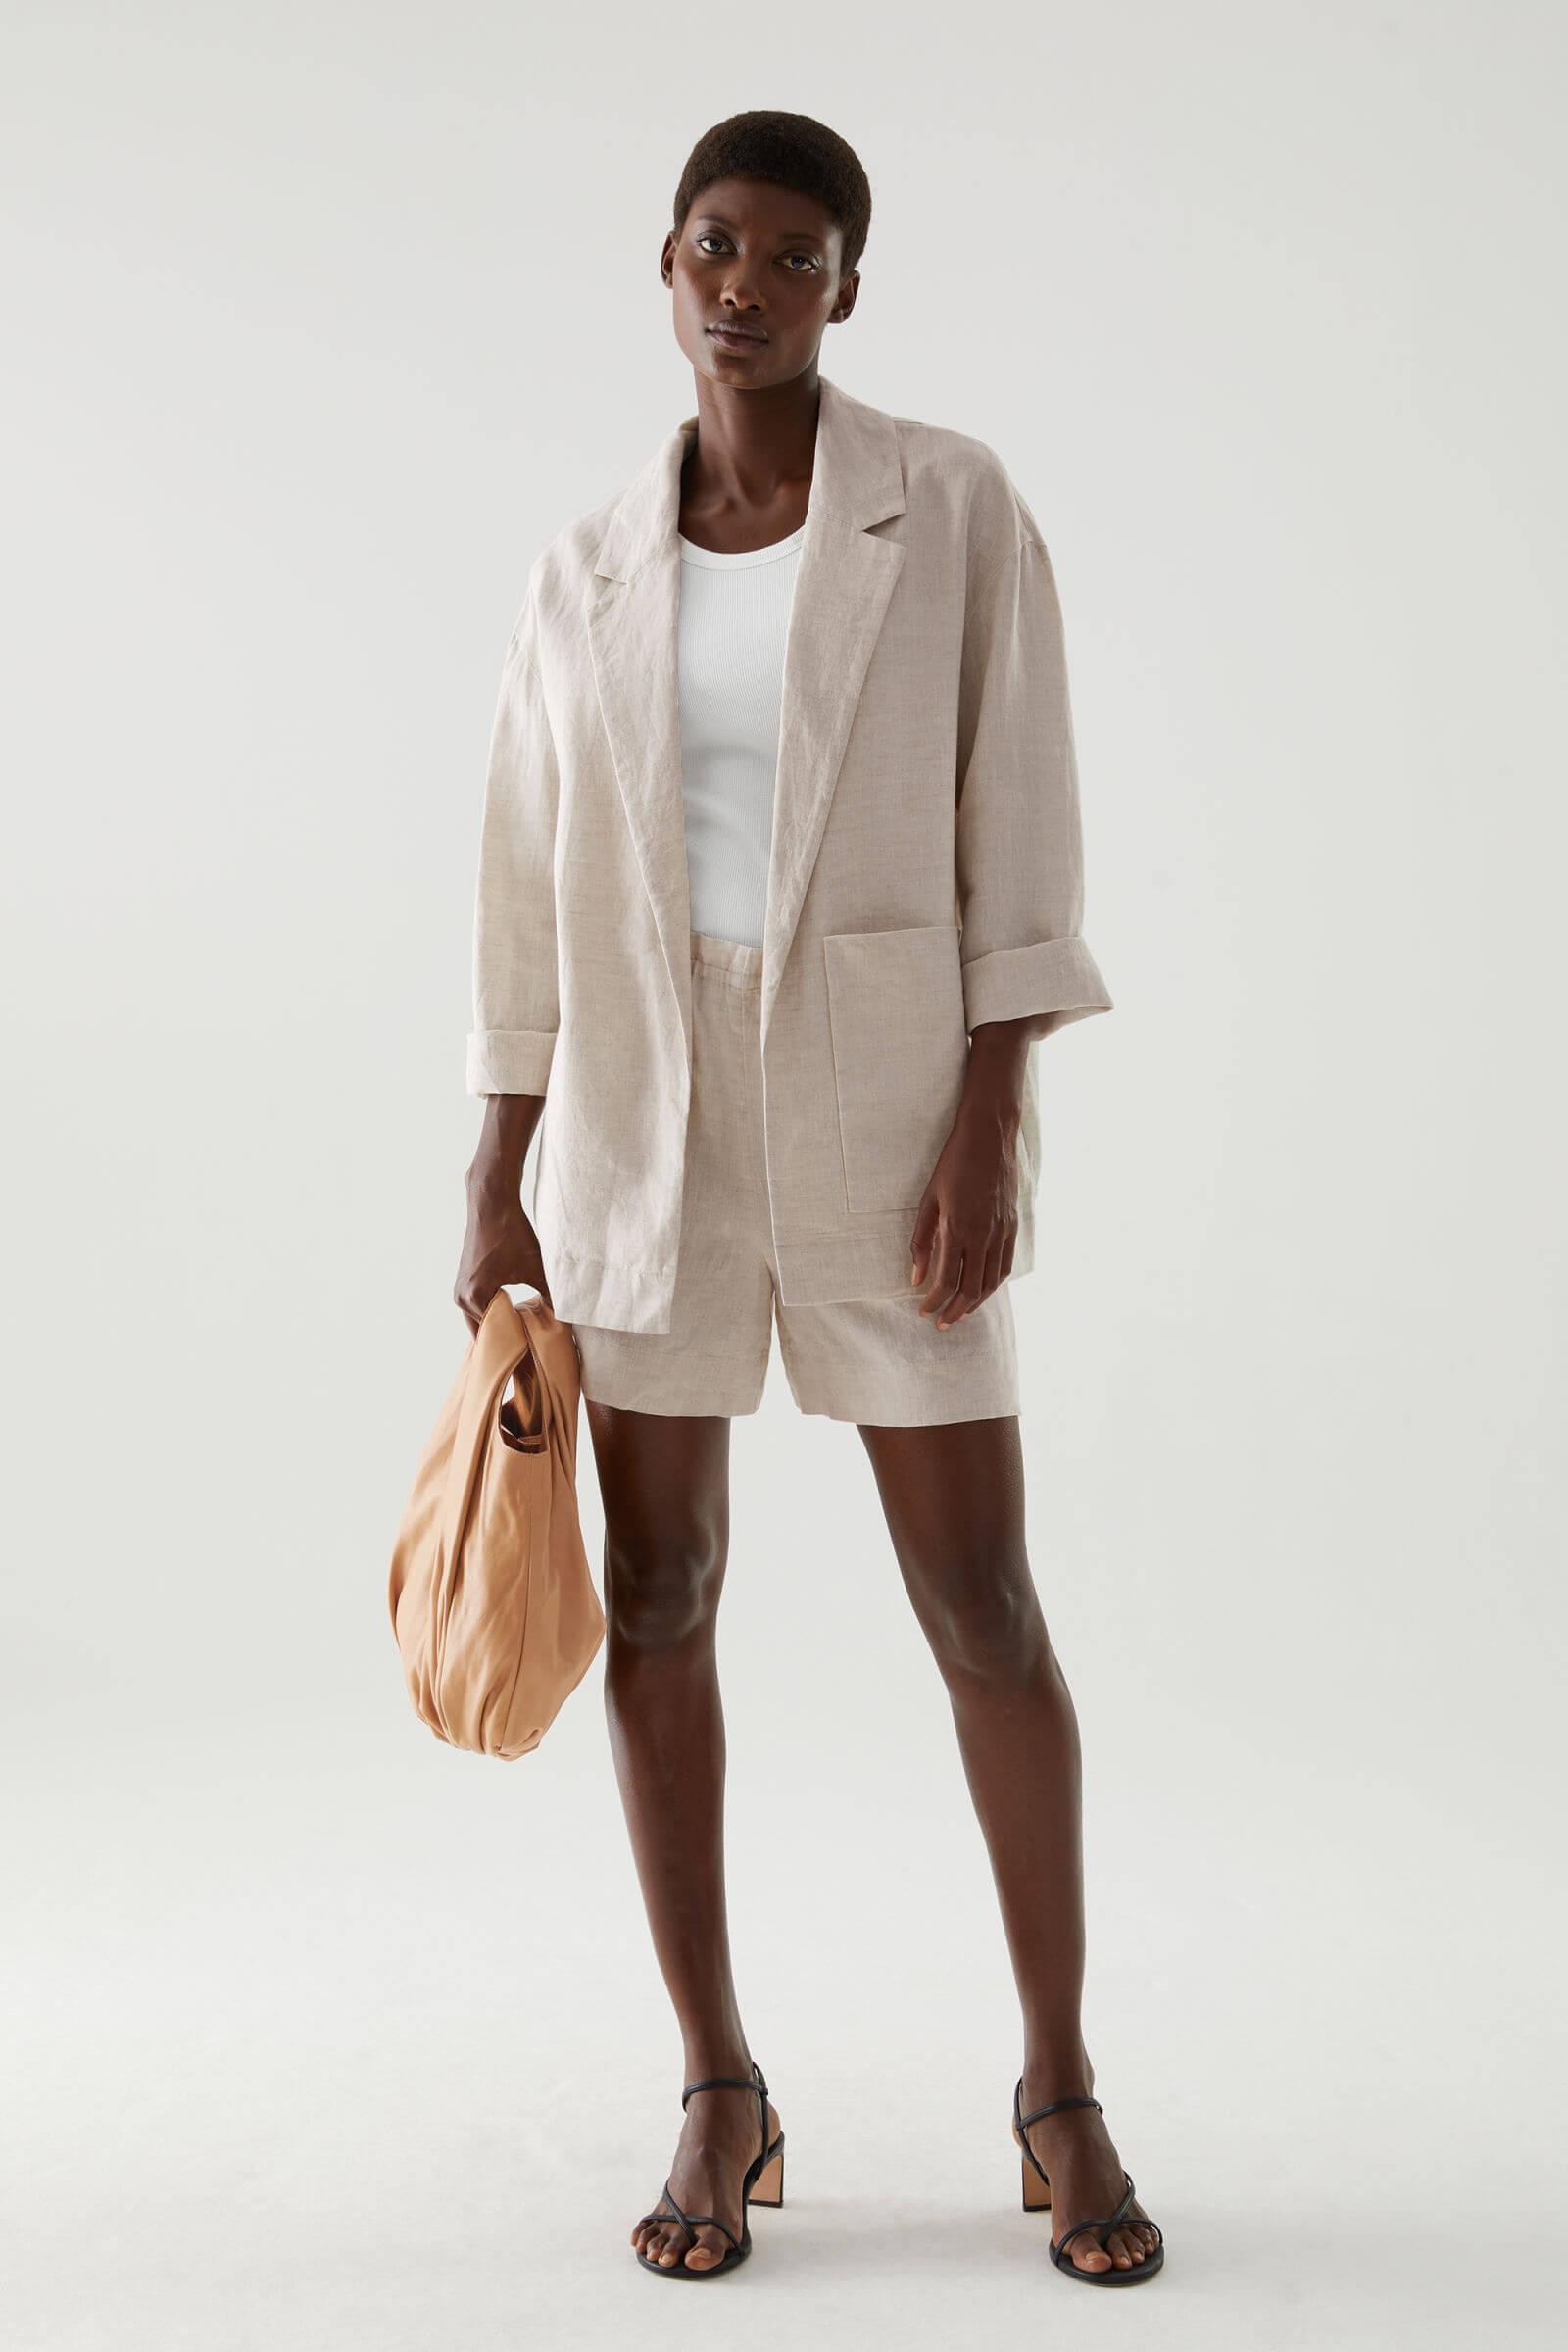 Linnekostym i beiget med shorts